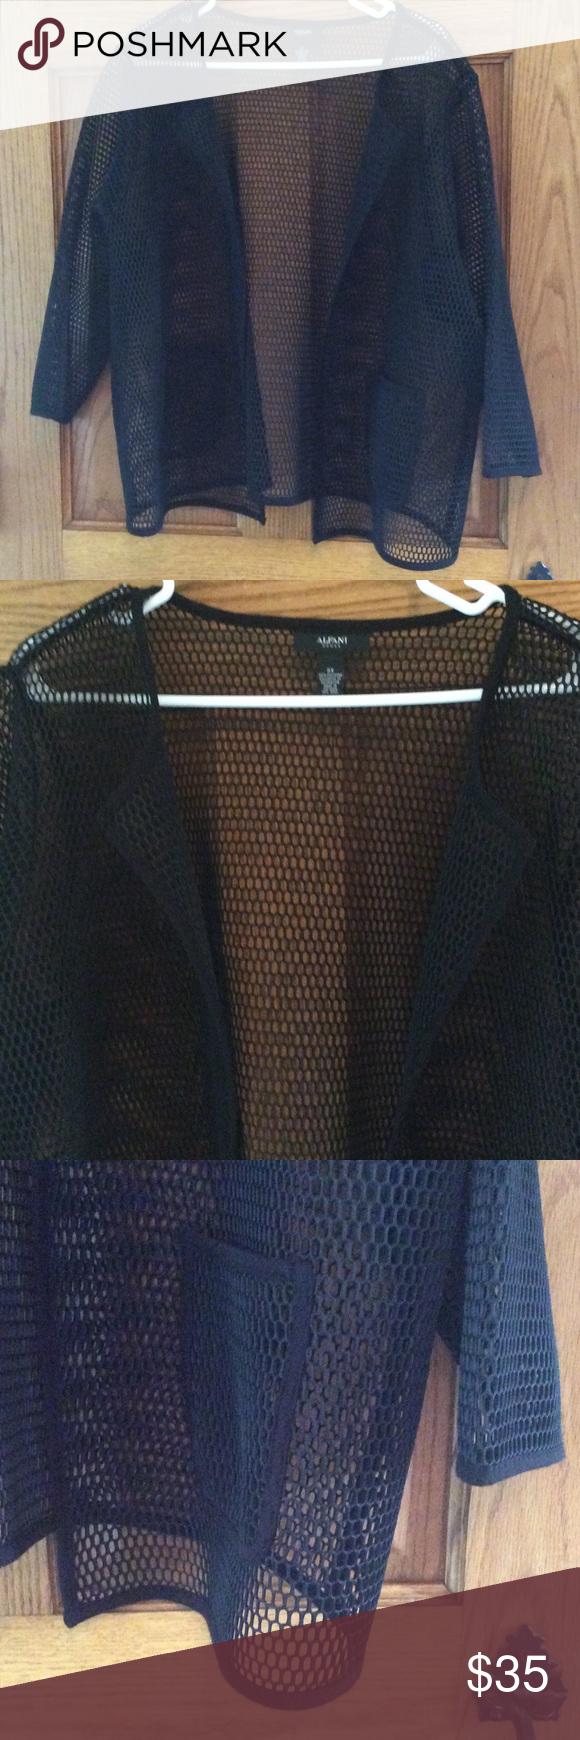 Alfani mesh style jacket Black mesh. 3/4 sleeves.  Front pockets.  Never worn Alfani Jackets & Coats Blazers